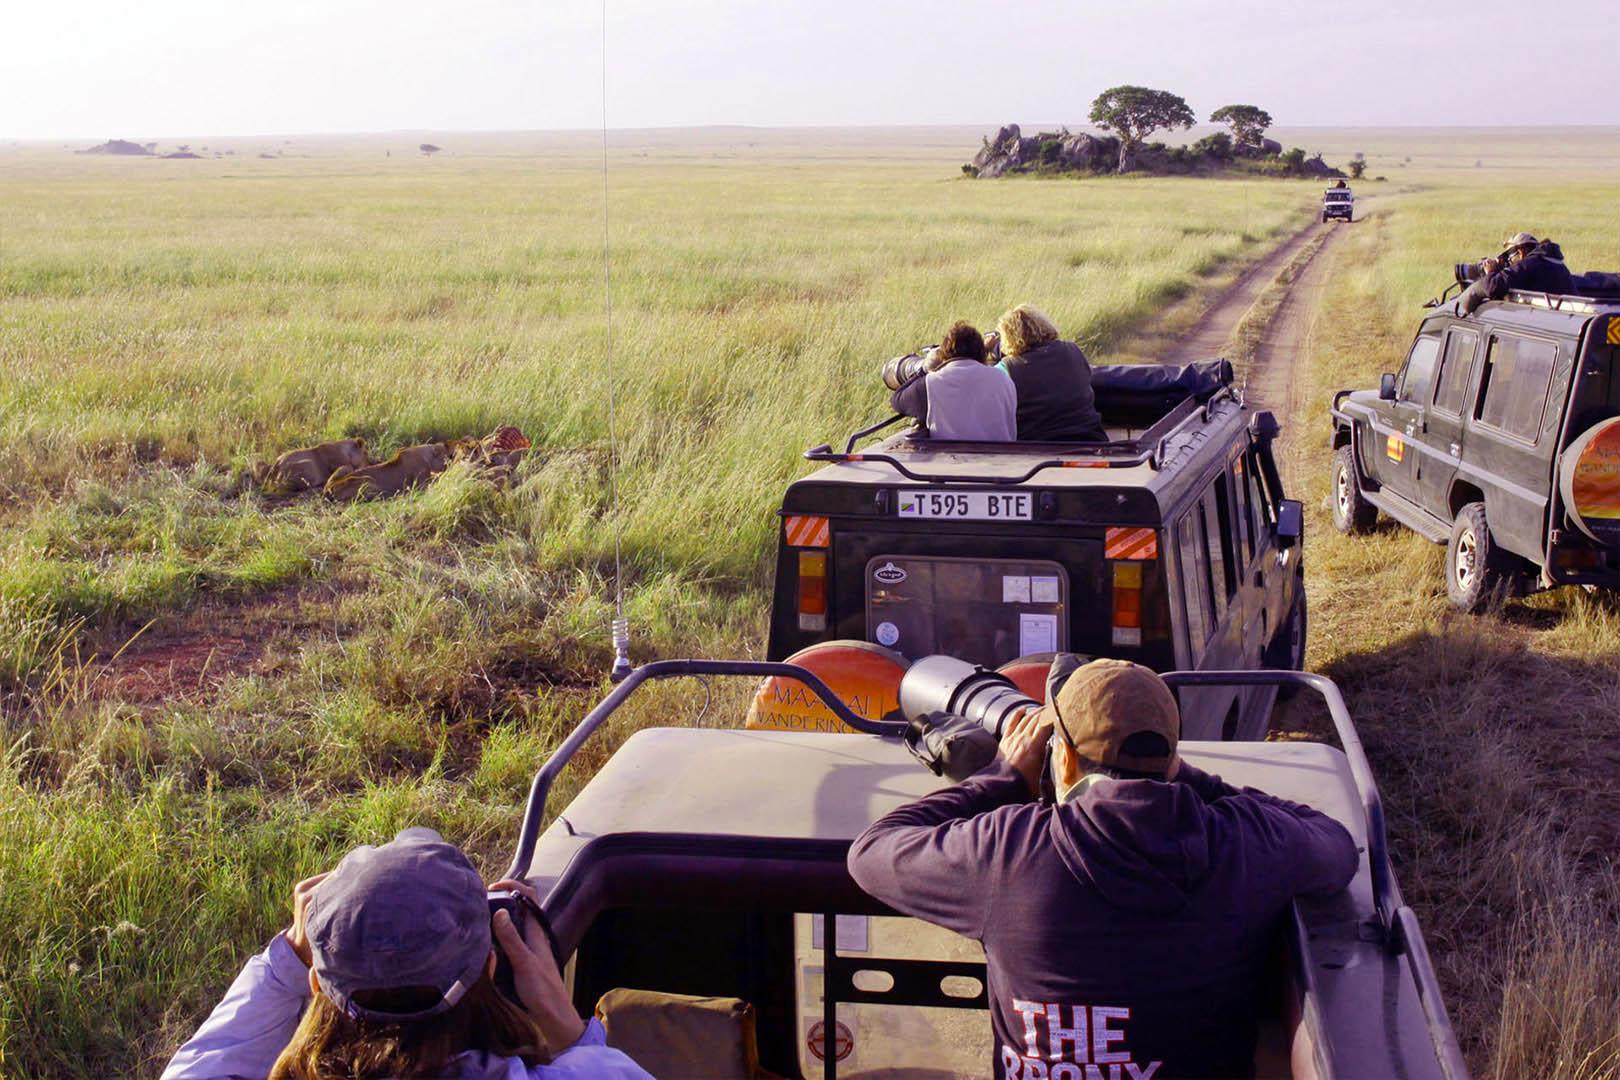 gallery-maasai-wanderings-safari-itineraries-signature-photo-safaris-africa-game